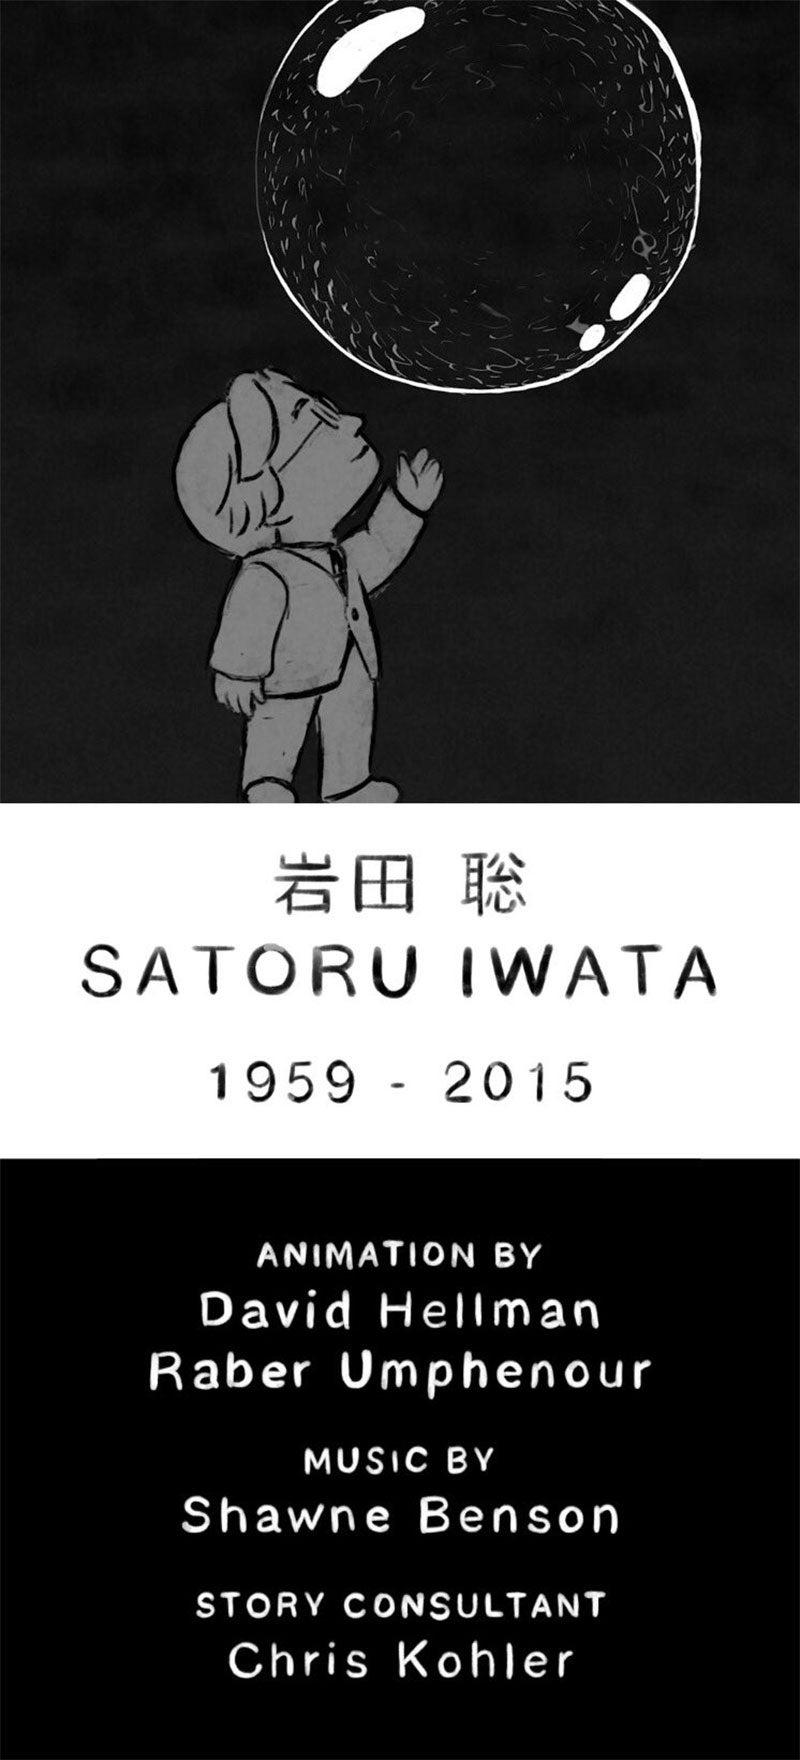 A Beautiful, Animated Tribute To Satoru Iwata